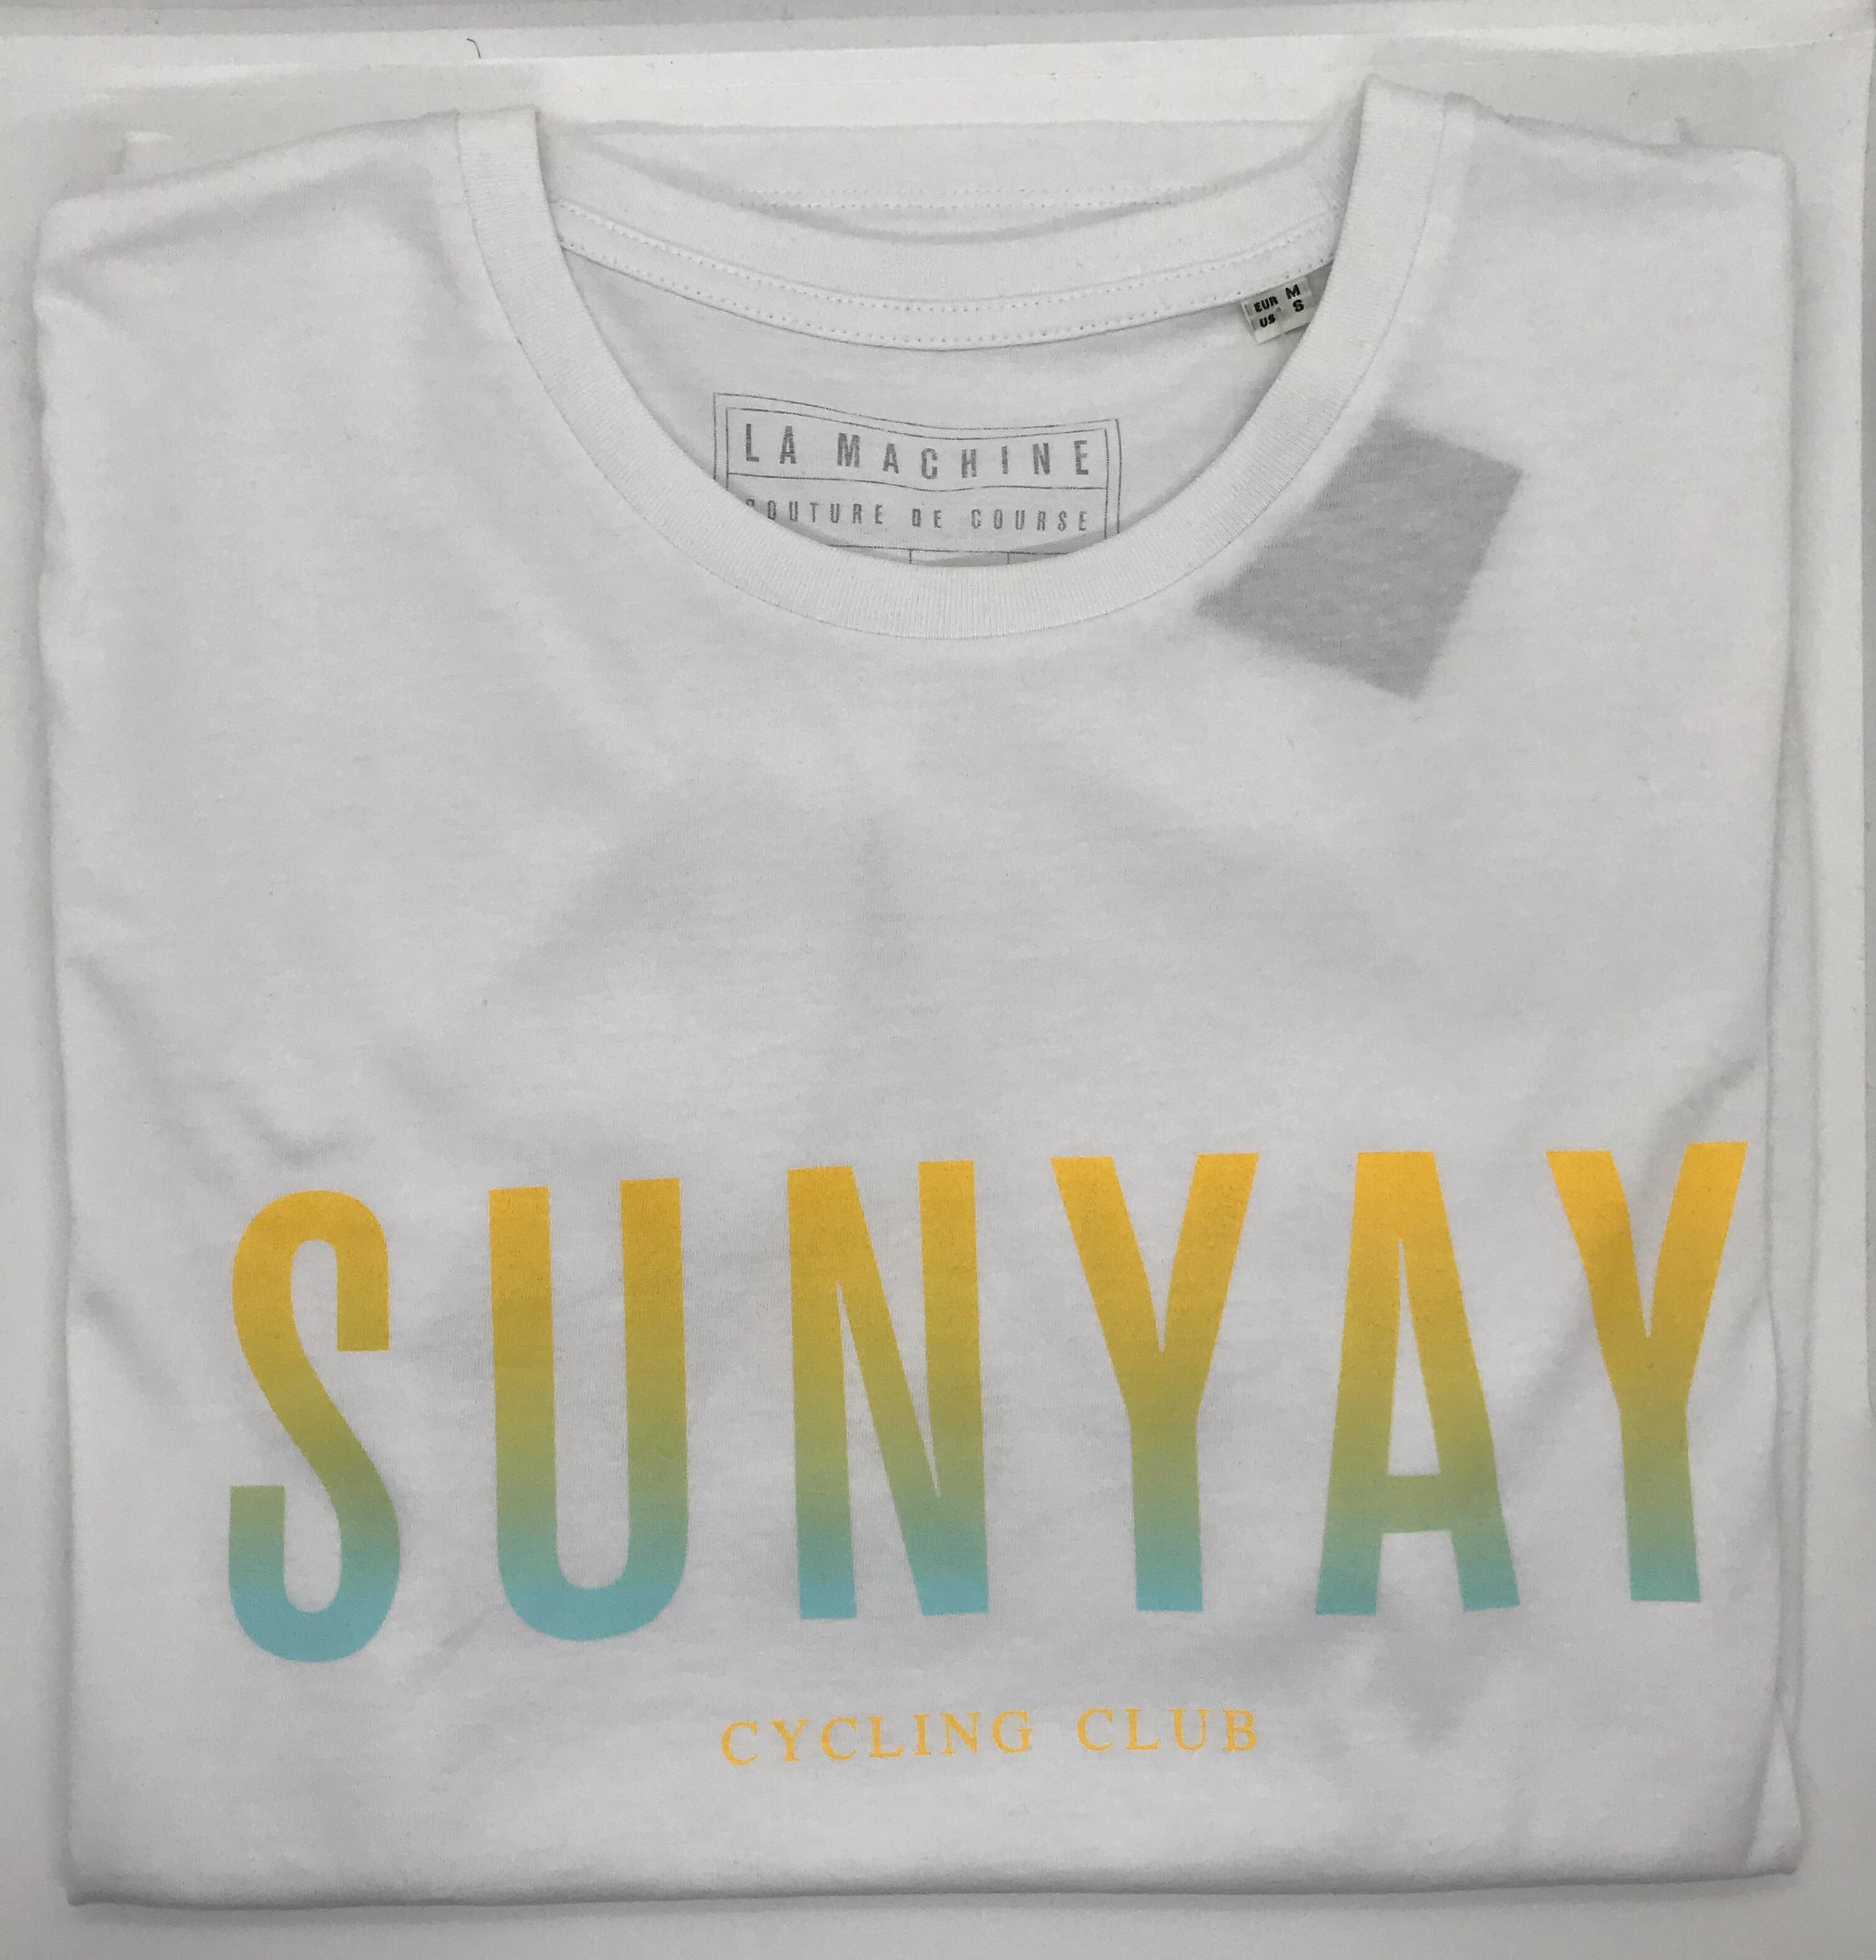 SUNYAY - T-shirt